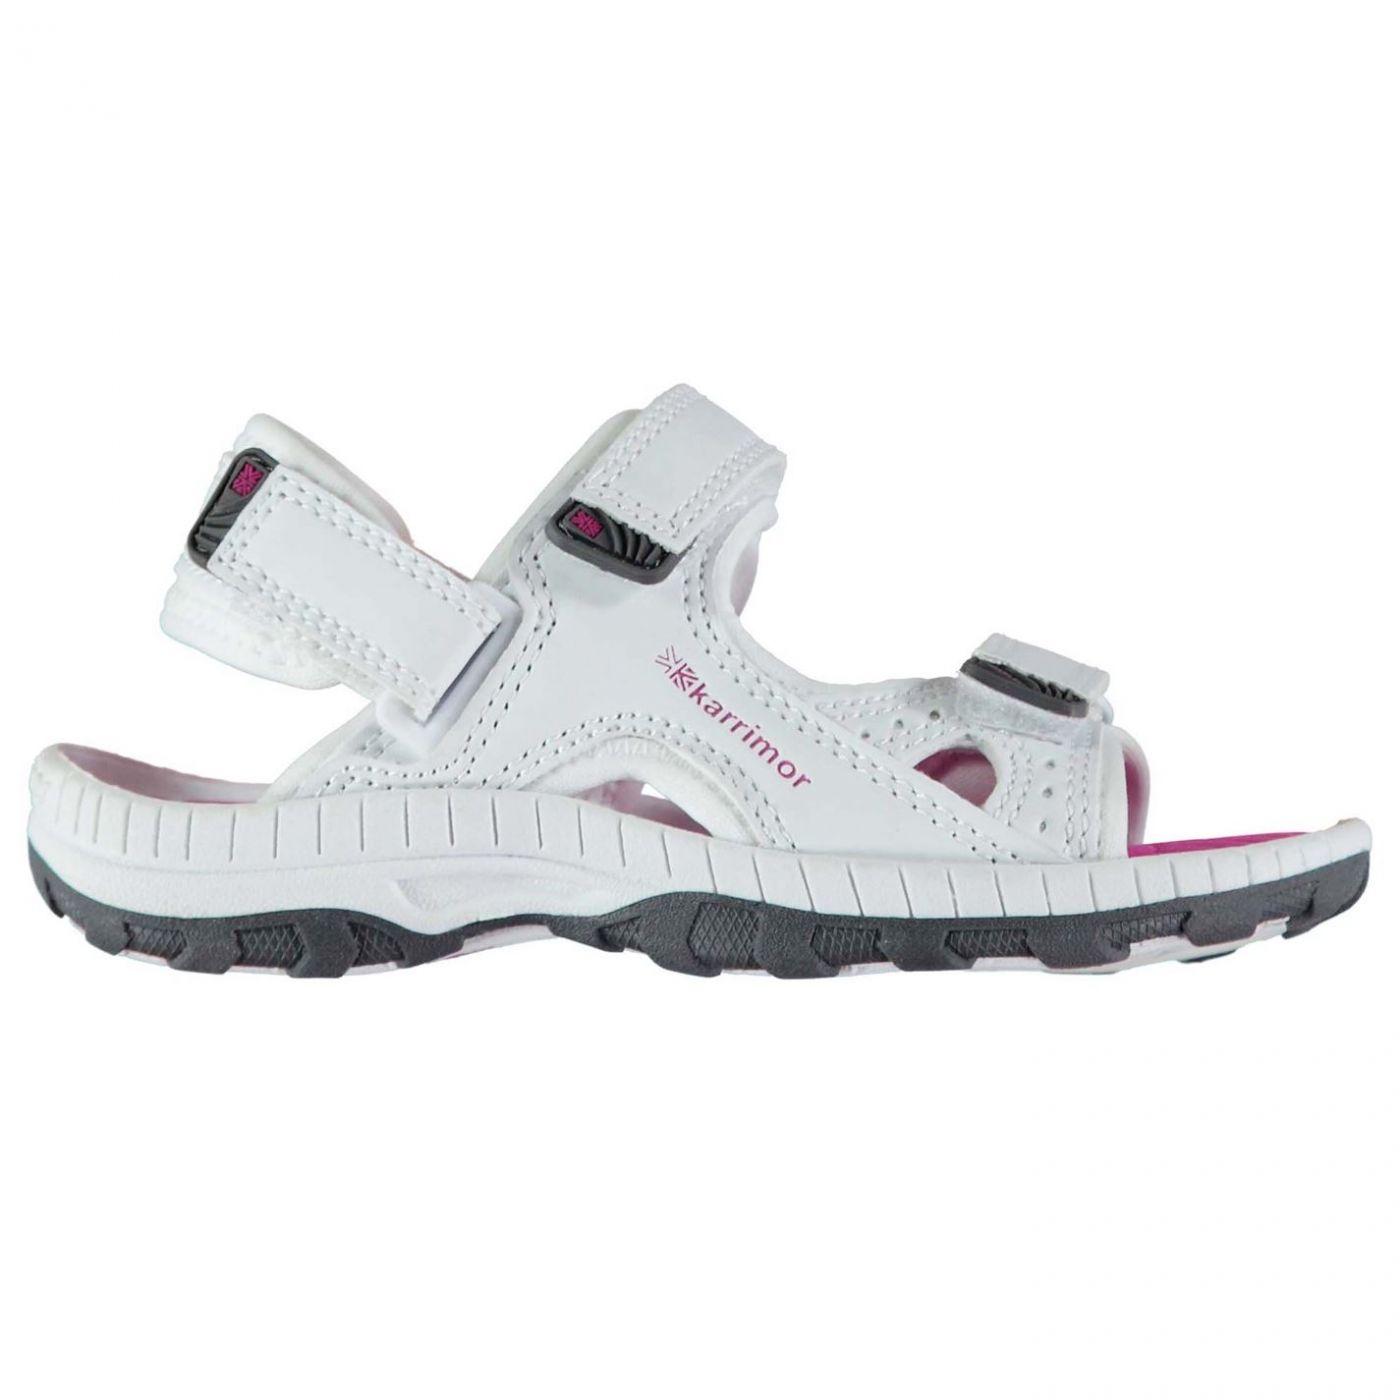 Karrimor Antibes Childs Sandals